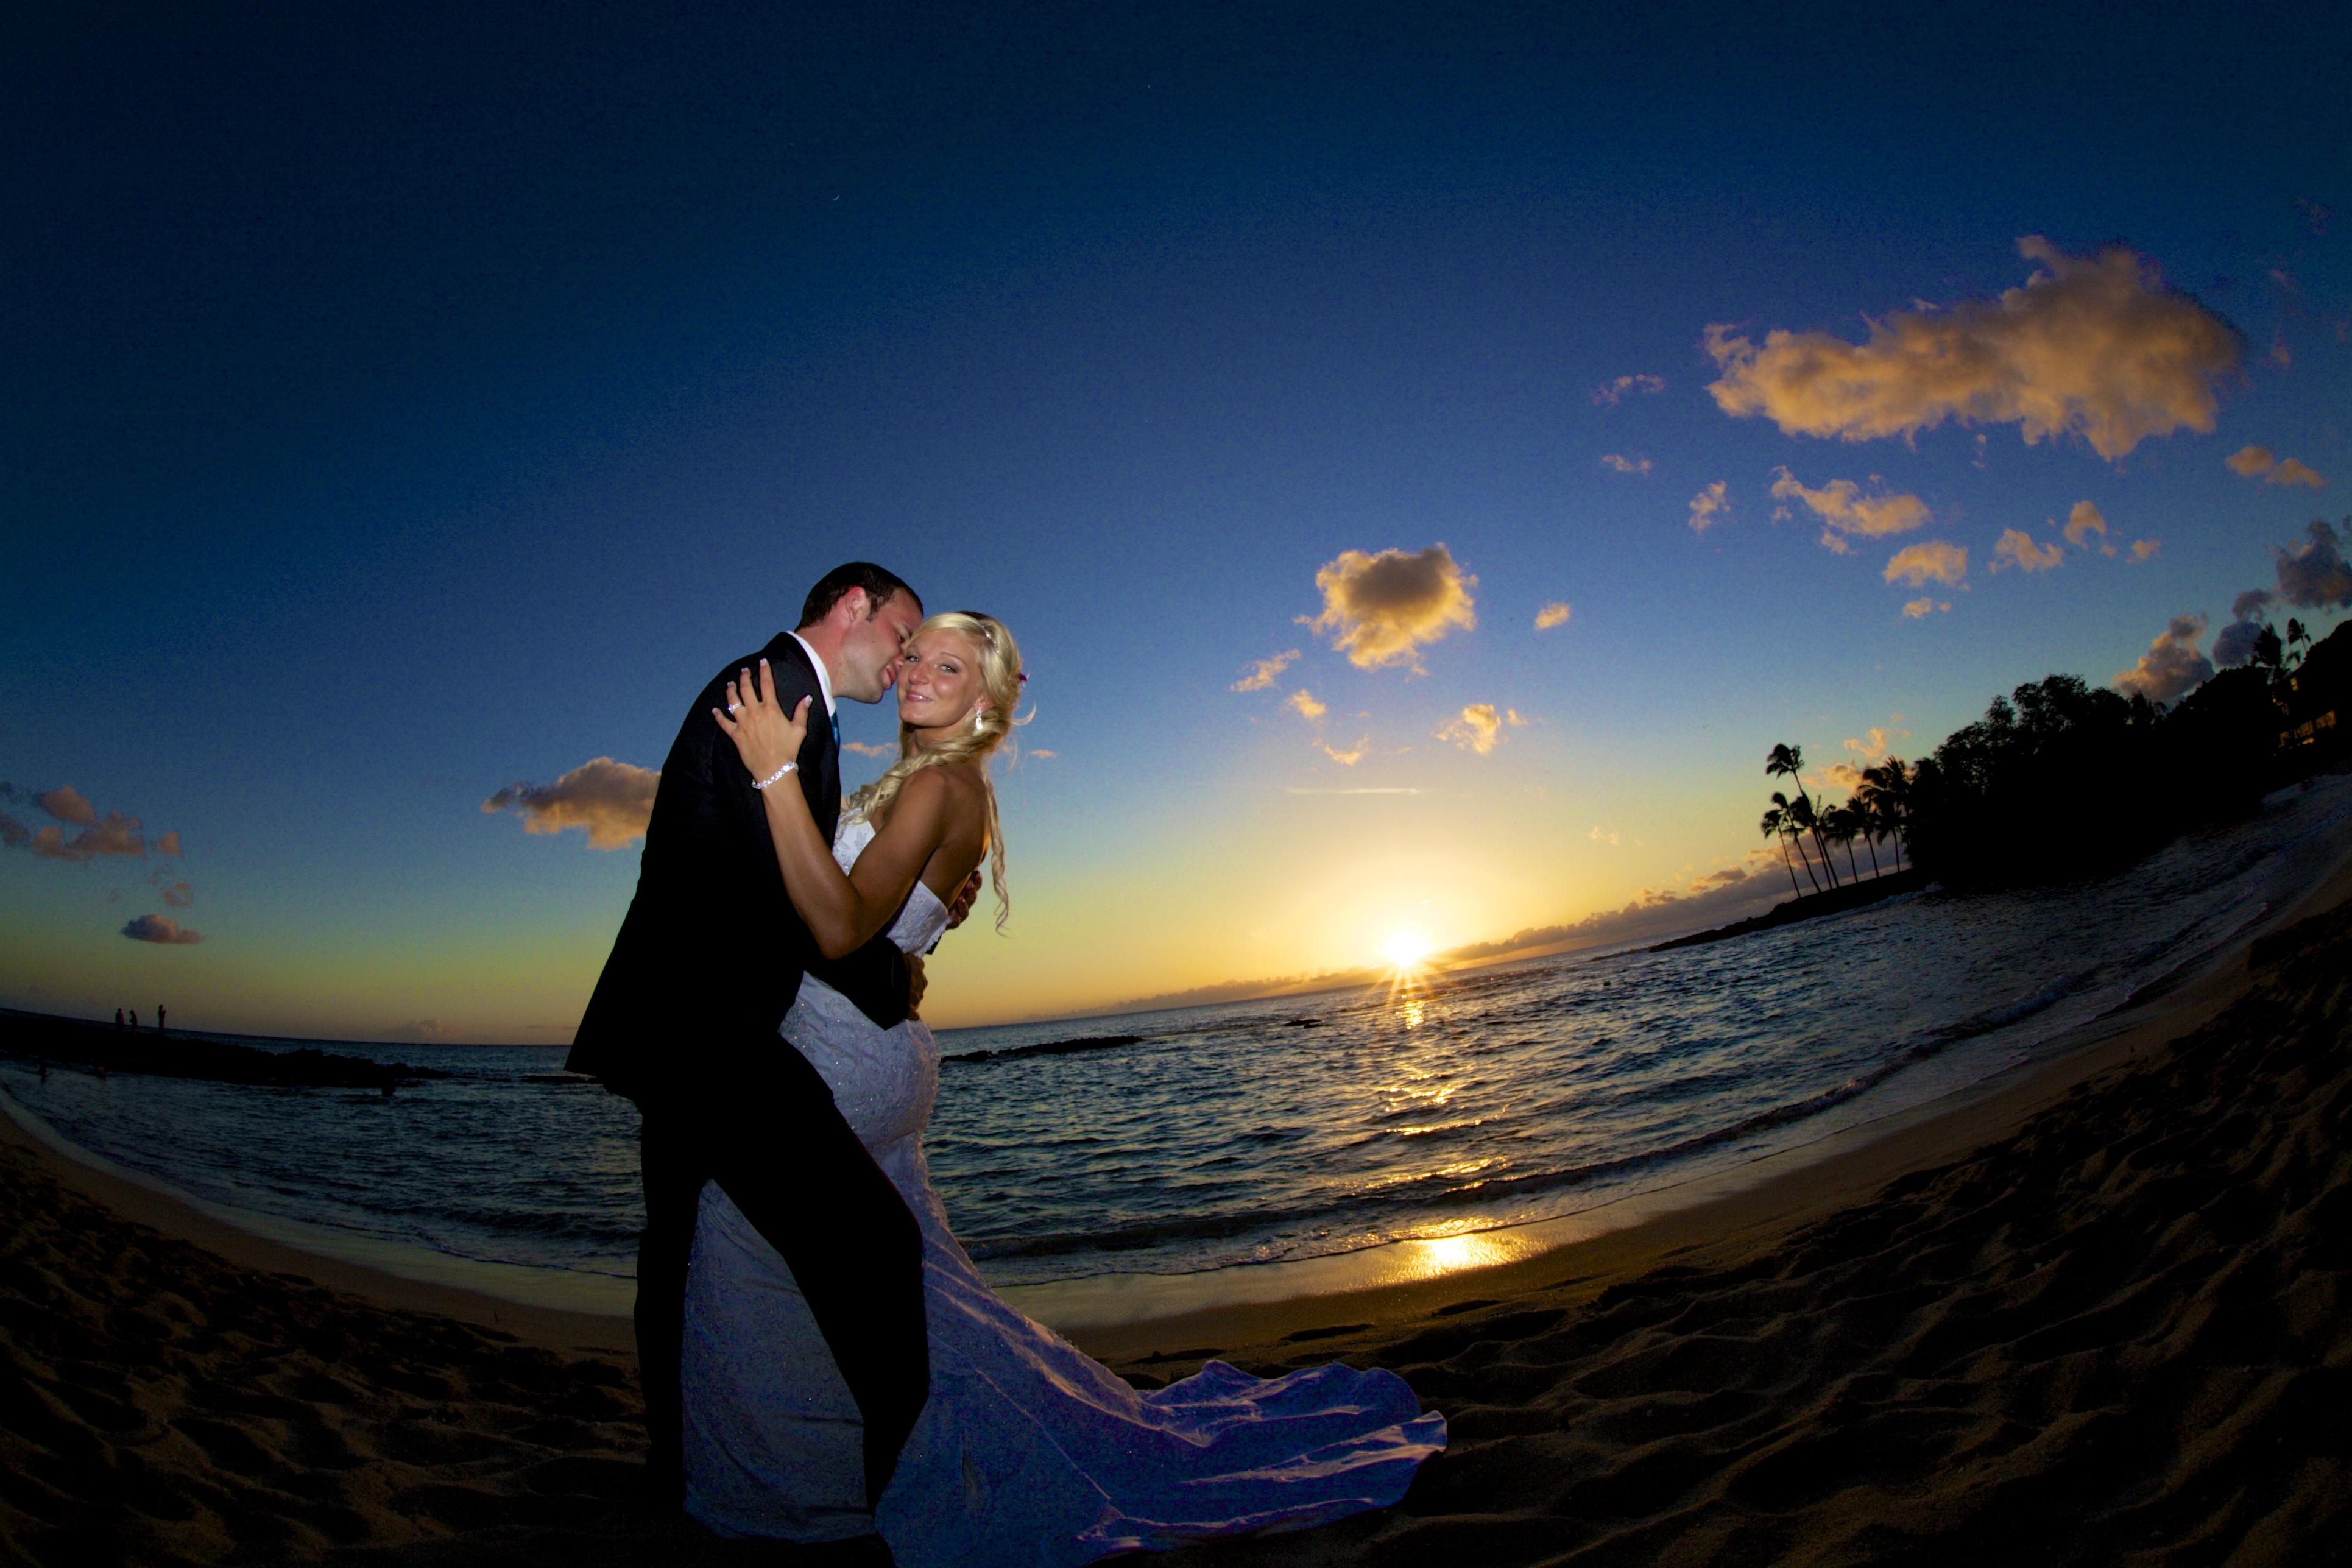 Sunset wedding photos in Hawaii 9